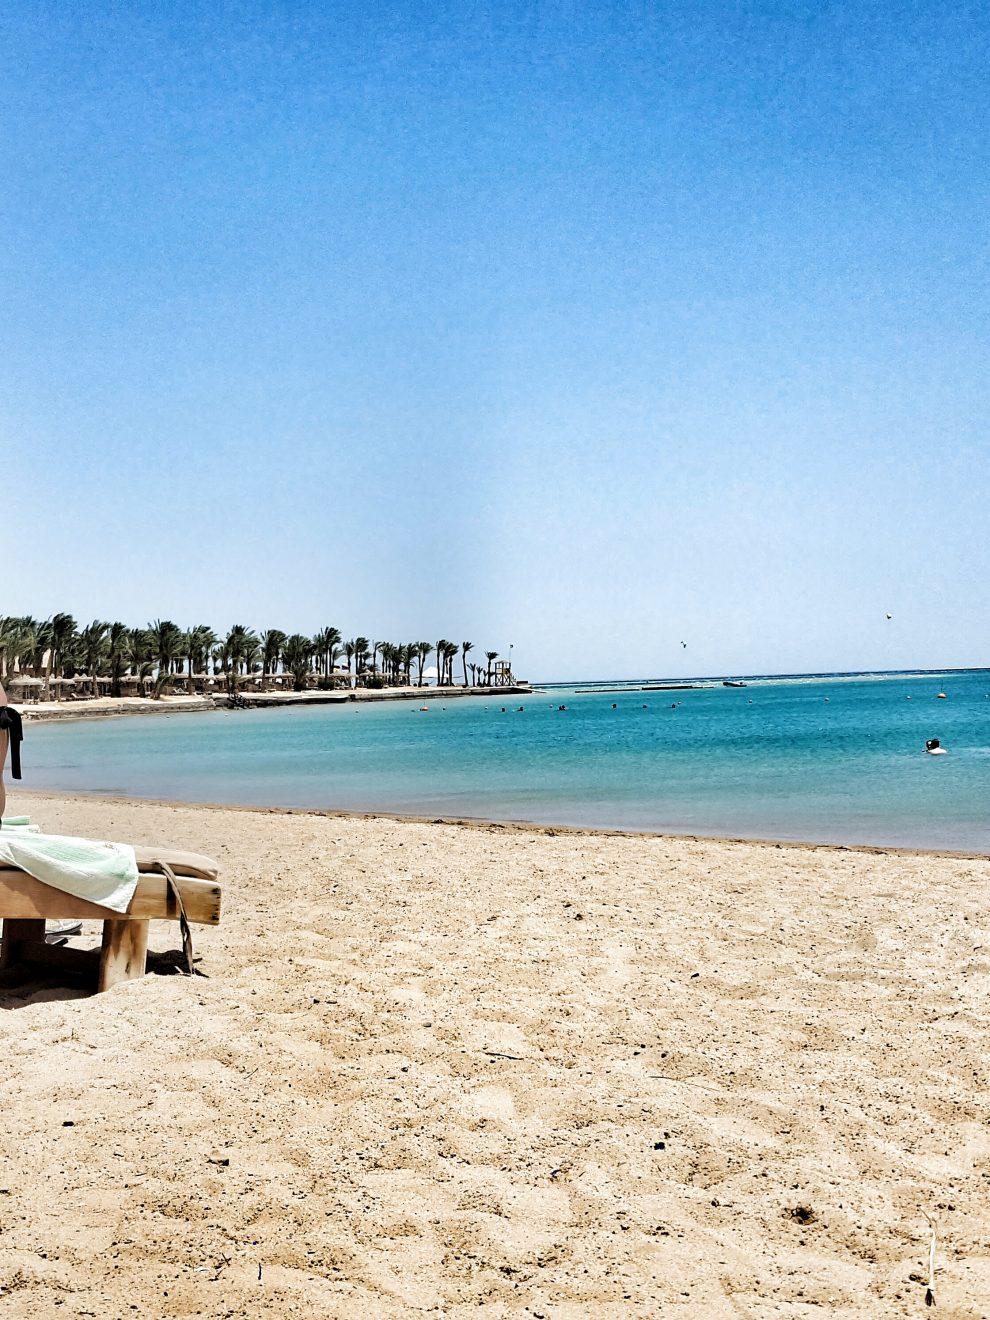 VIZE ZA EGIPAT DUPLO SKUPLJE?